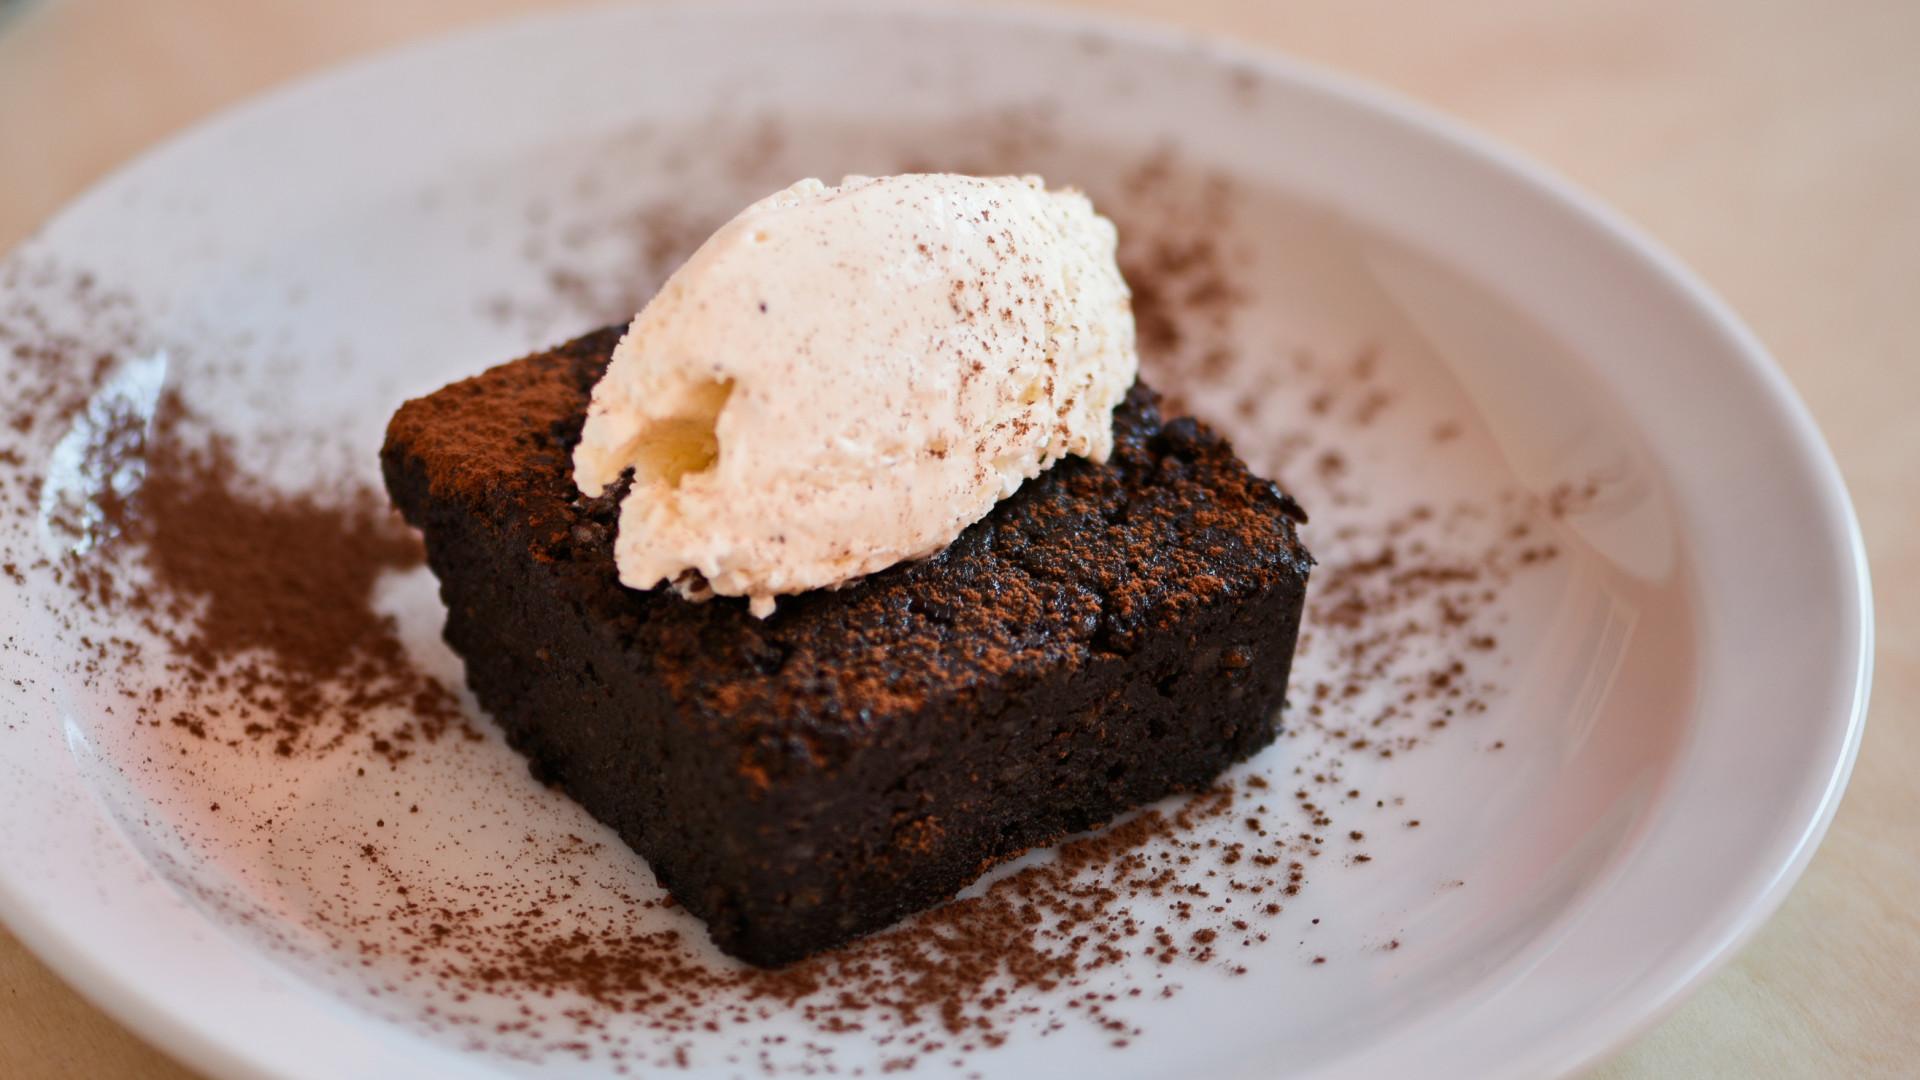 Chuku's meal kit | The yam brownie